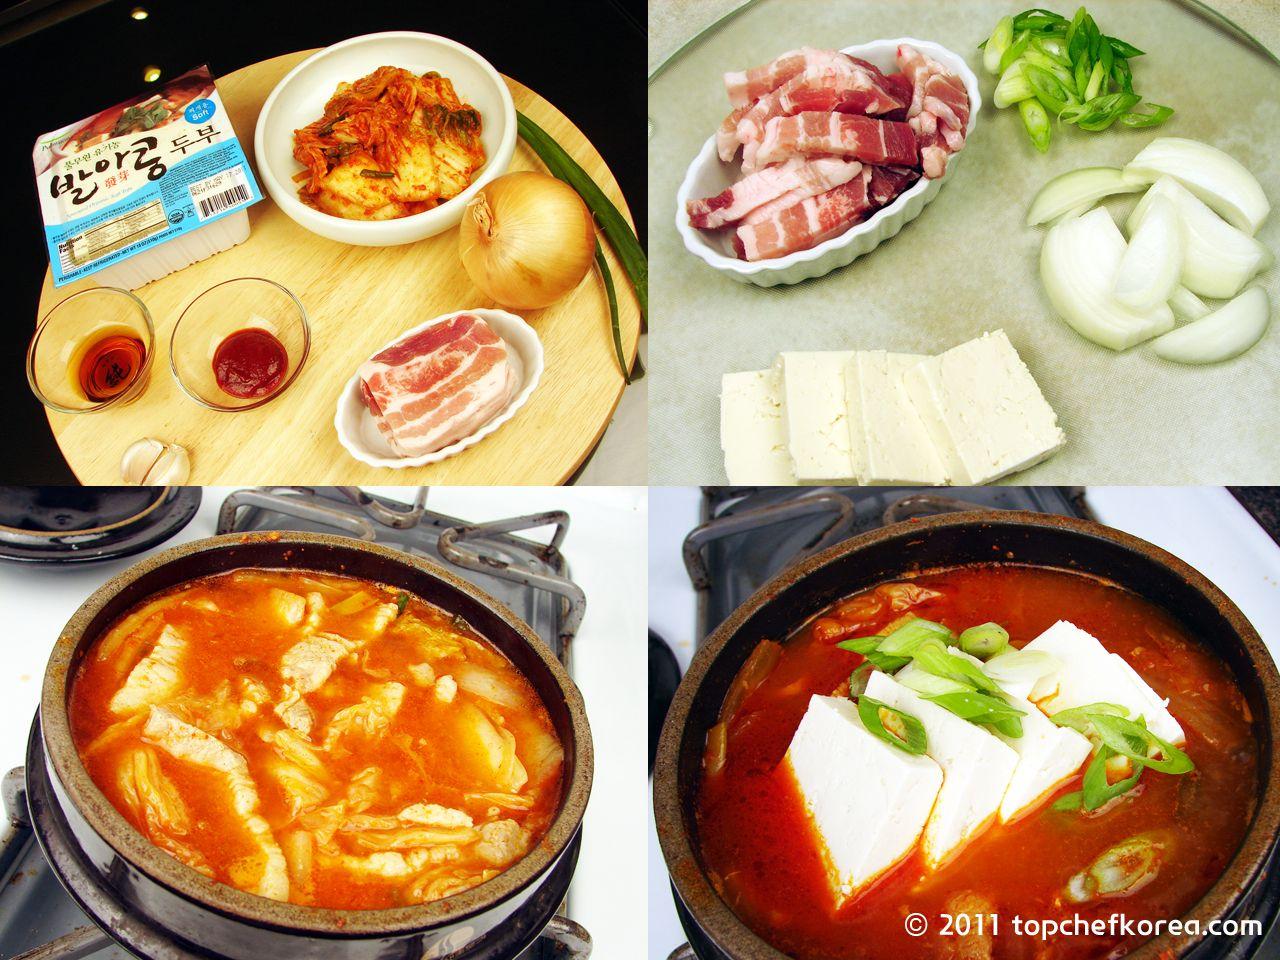 Kimchi jjigae kimchi stew authentic korean food kimchi jjigae kimchi stew authentic korean food recipes in english forumfinder Image collections